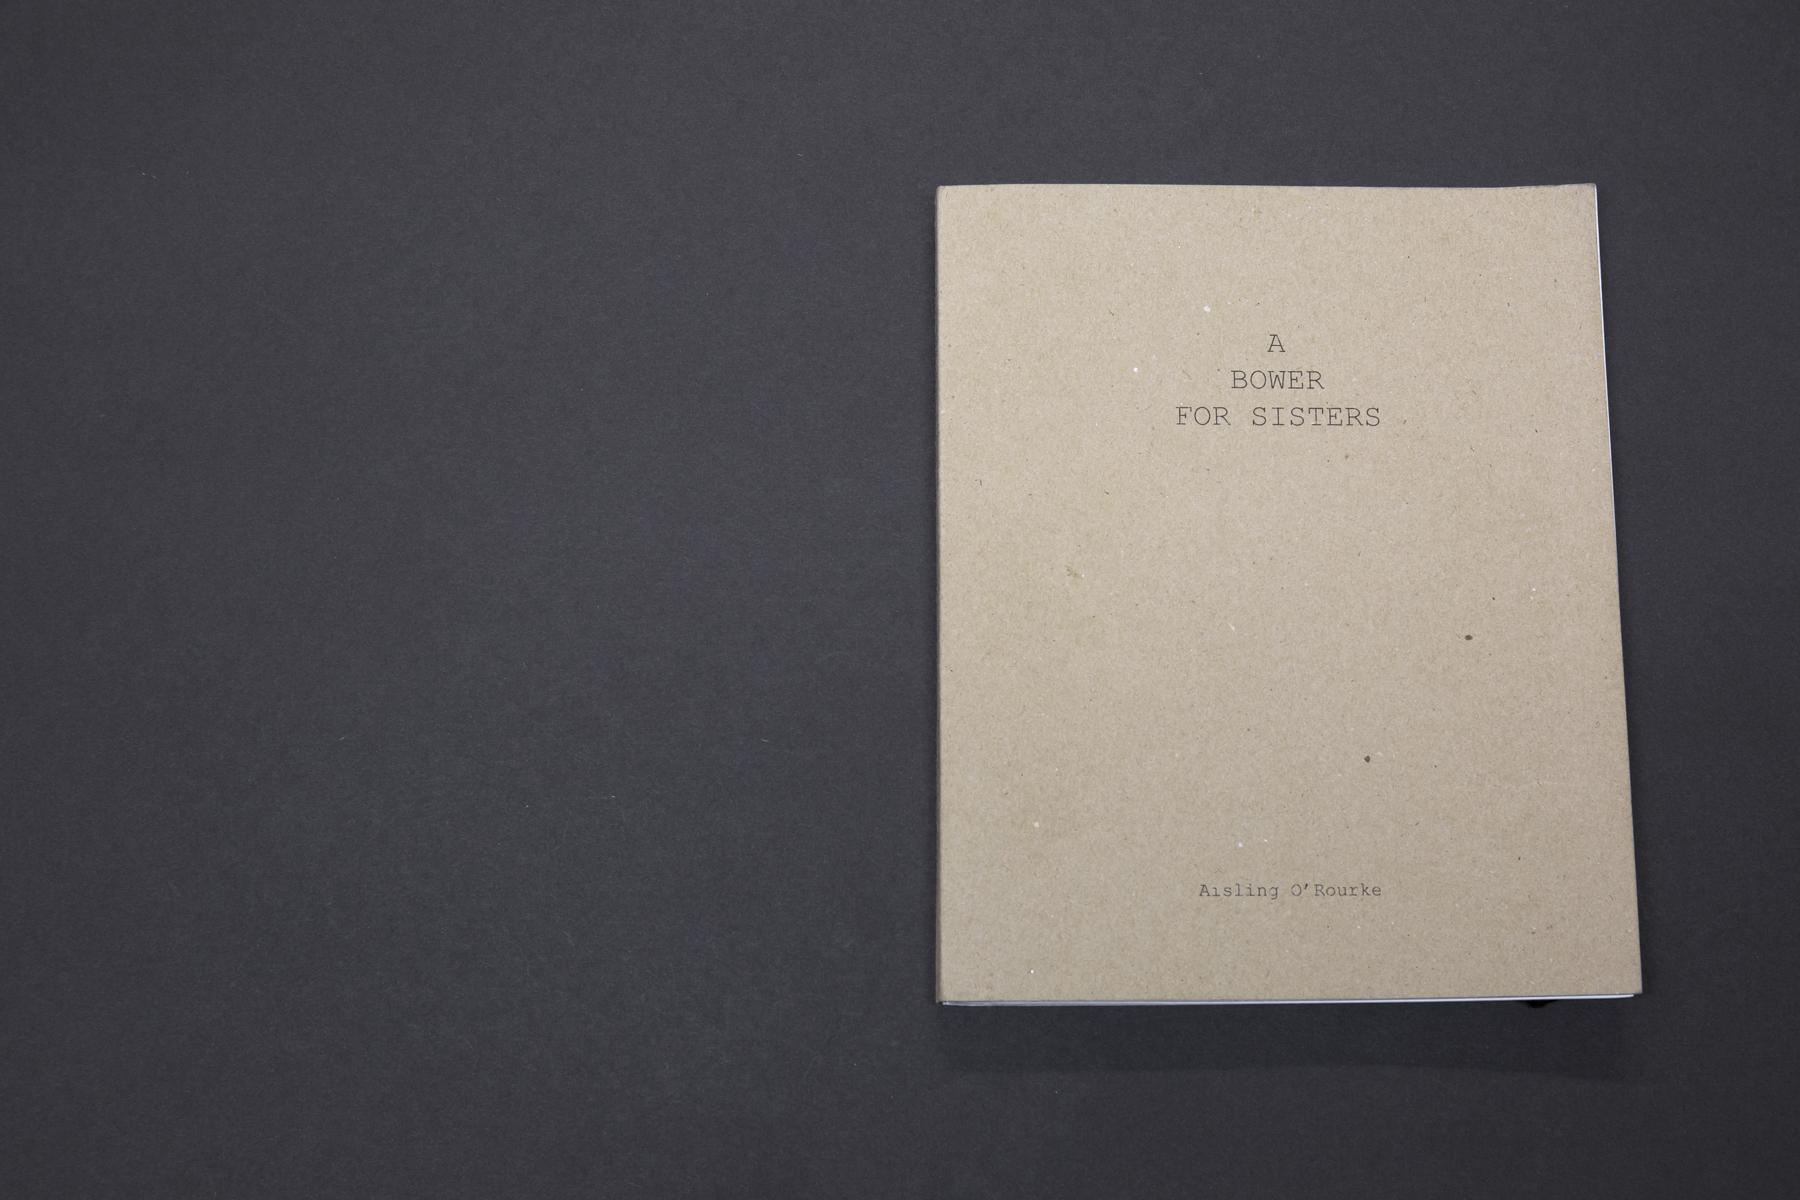 abowerforsisters-book-8.jpg